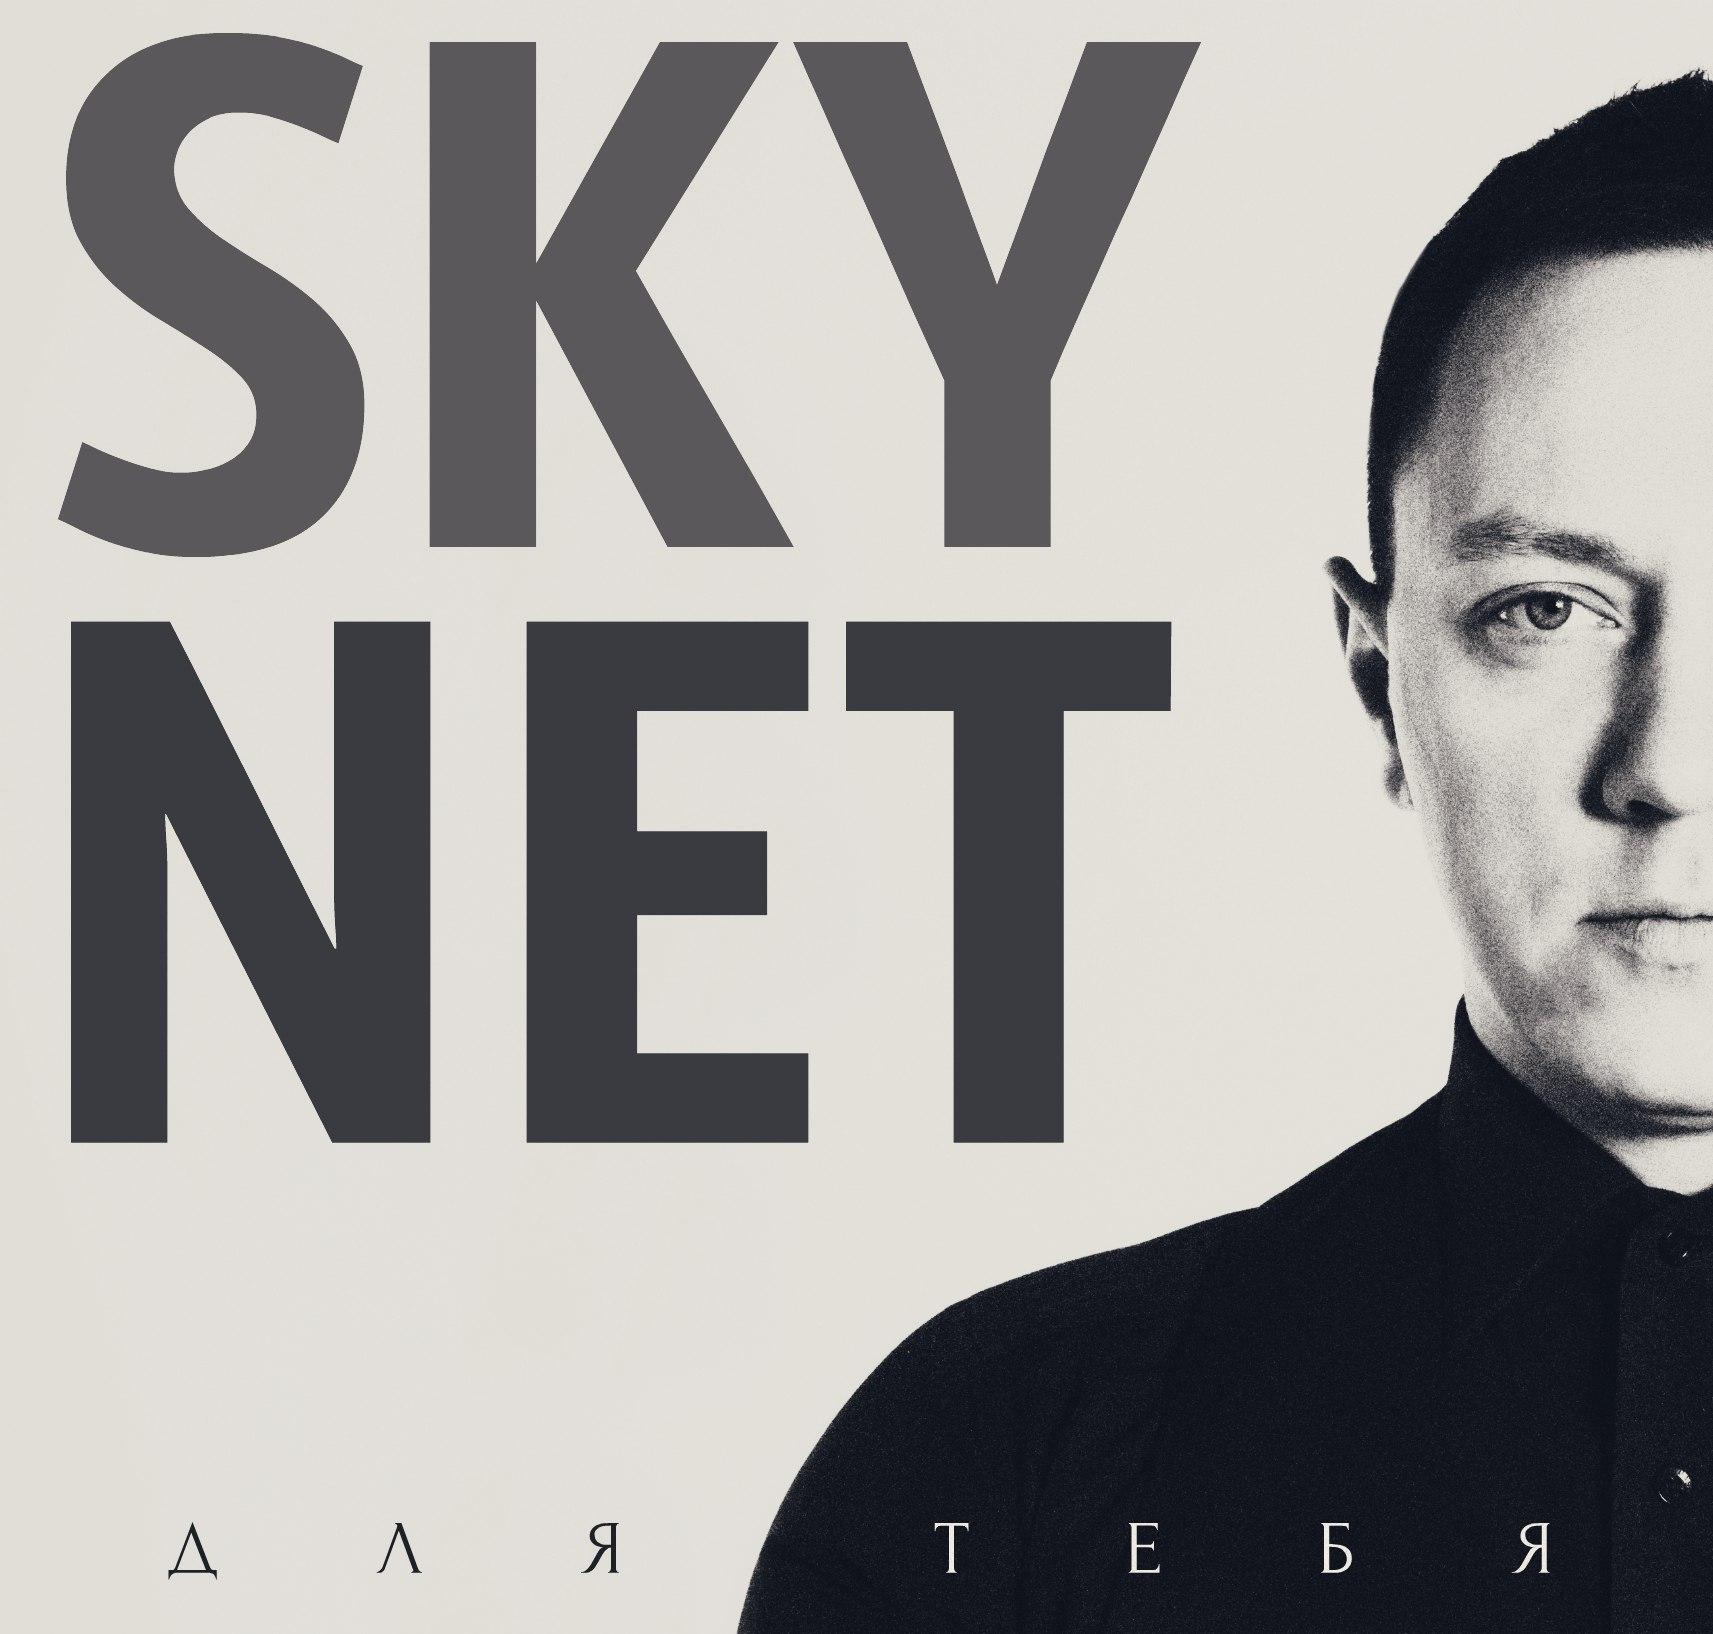 Альбом SKYNET - Для тебя